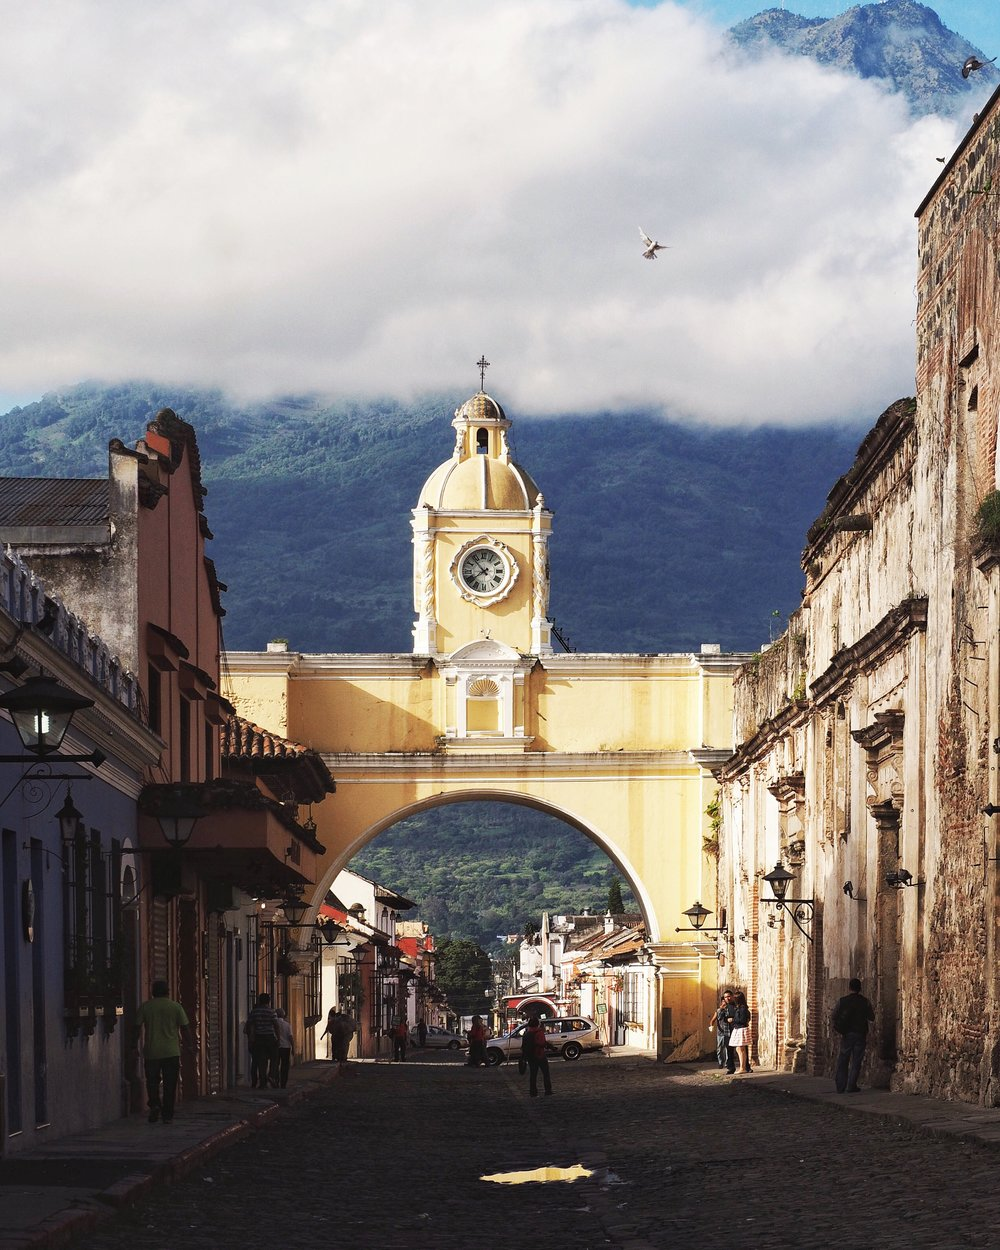 Antigua's picturesque, famous arch